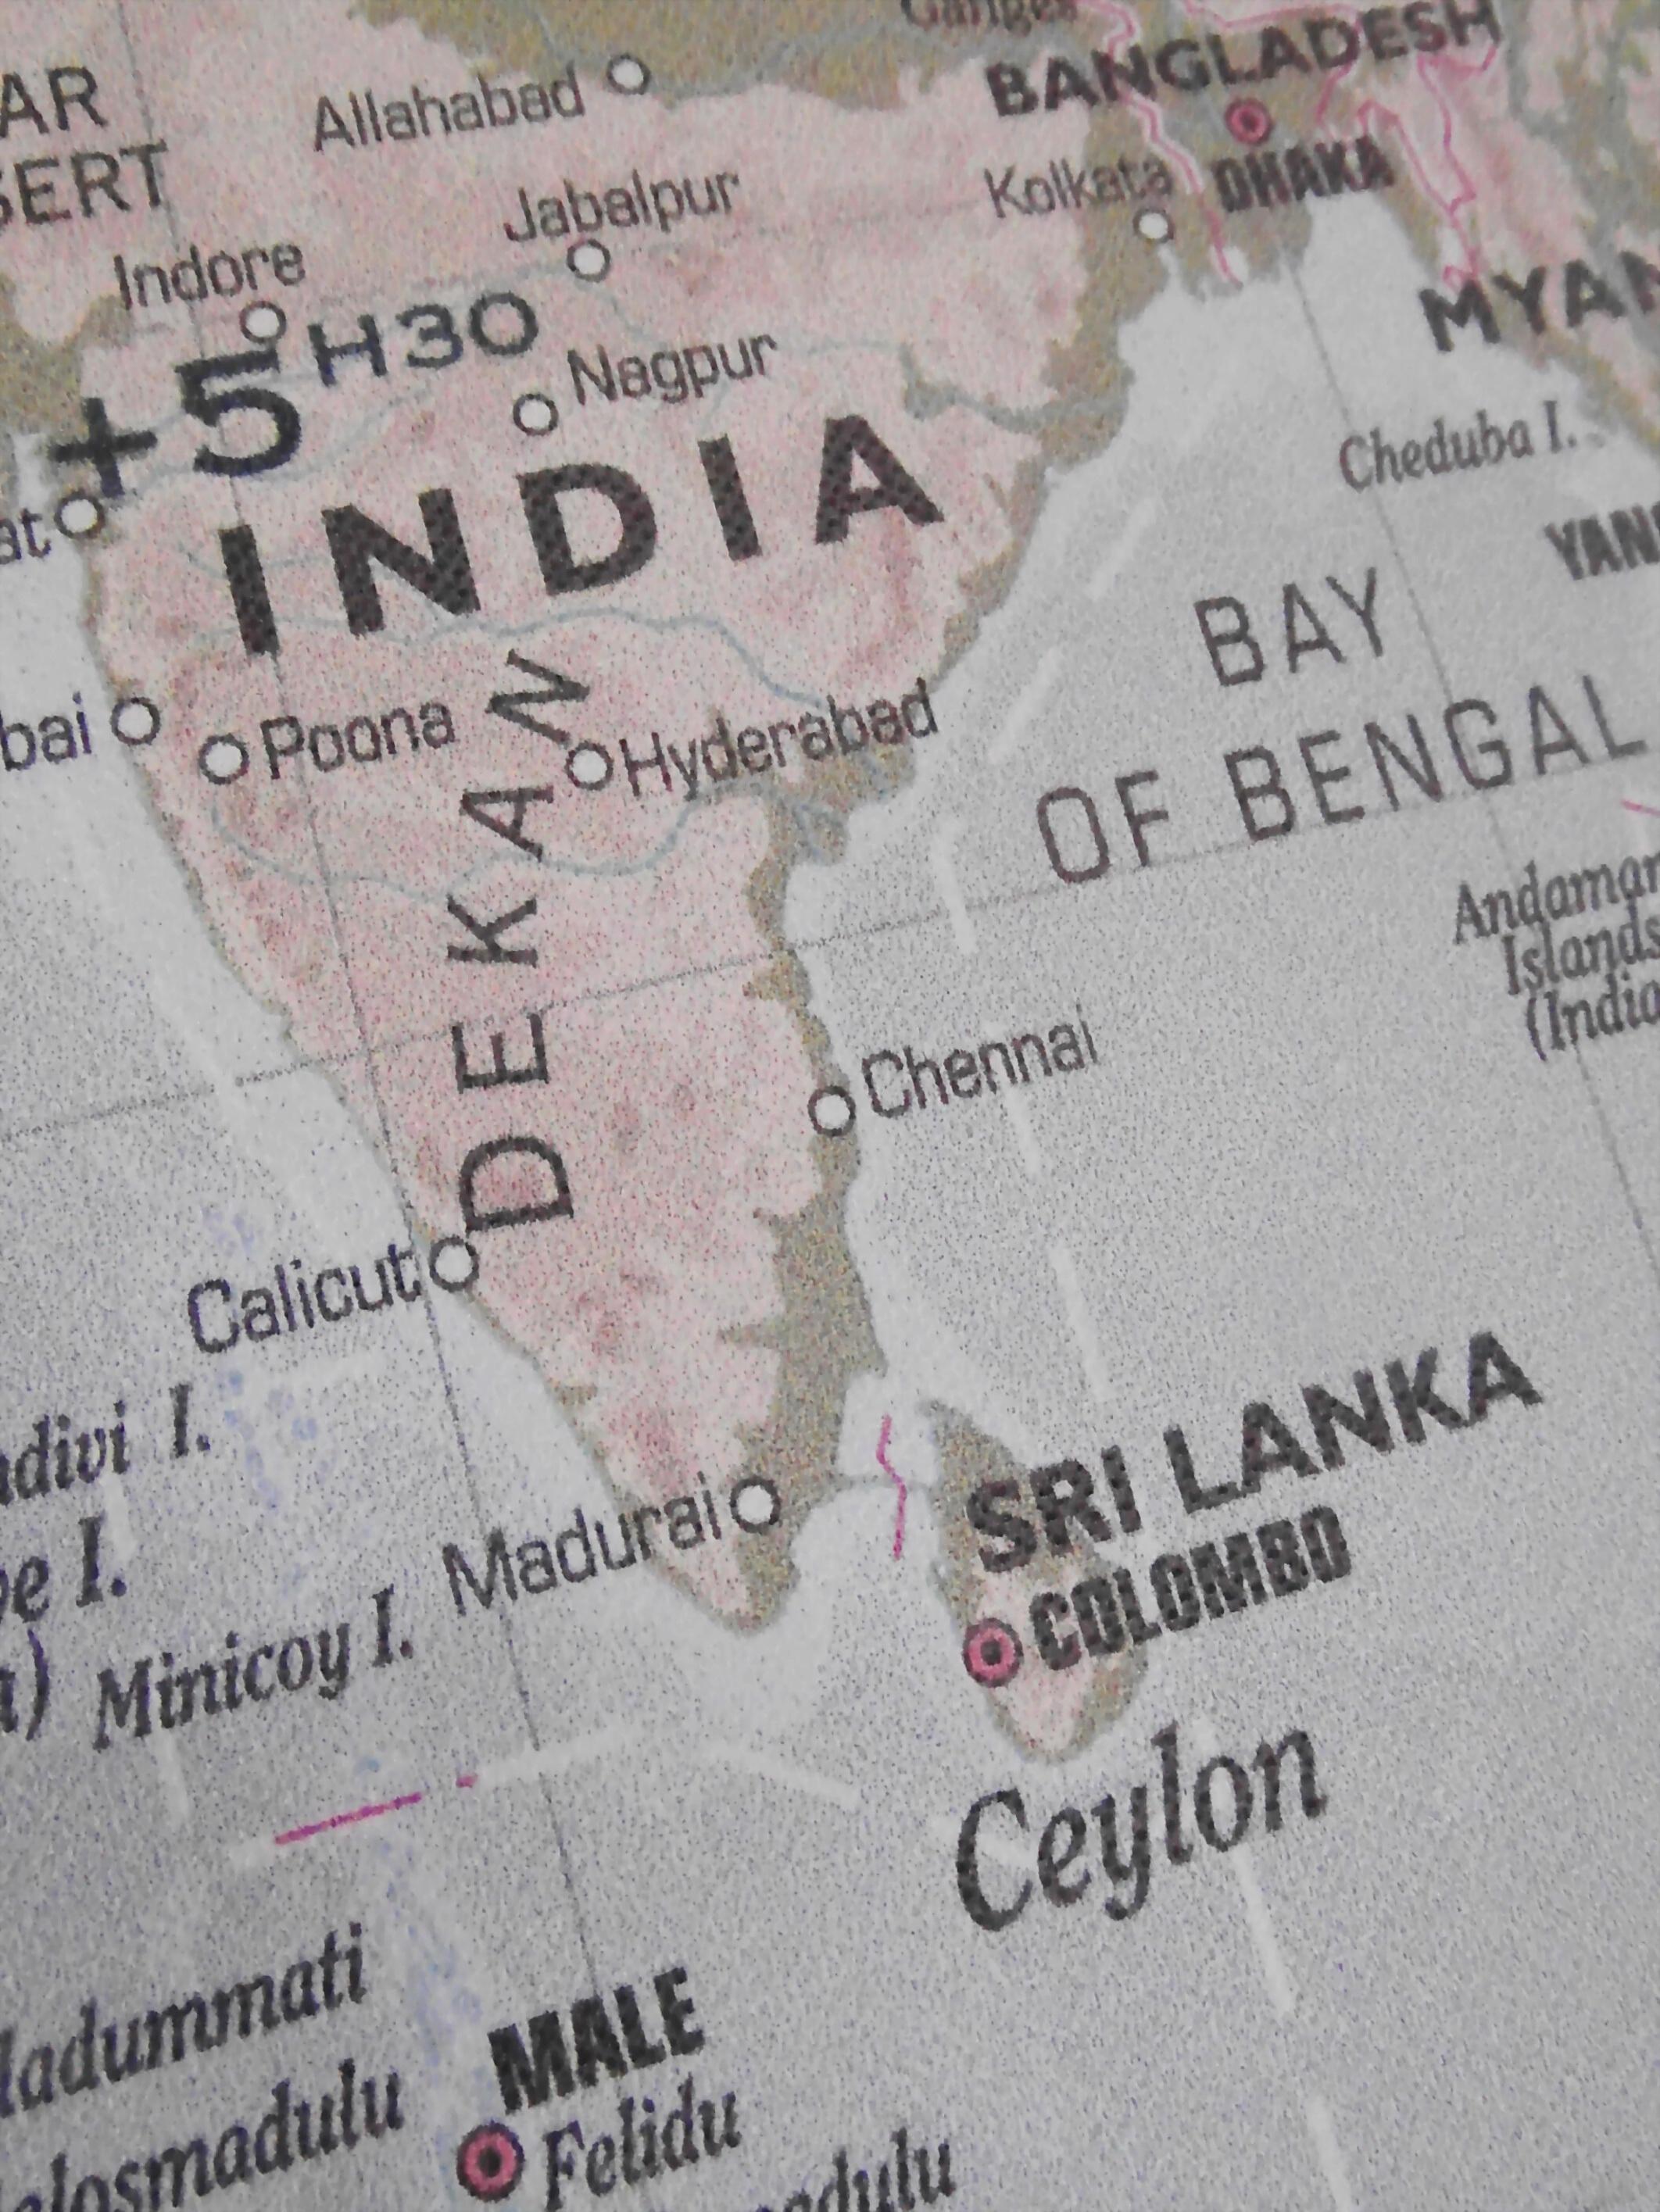 India Map, Atlas, Bangladesh, Chennai, Cities, HQ Photo